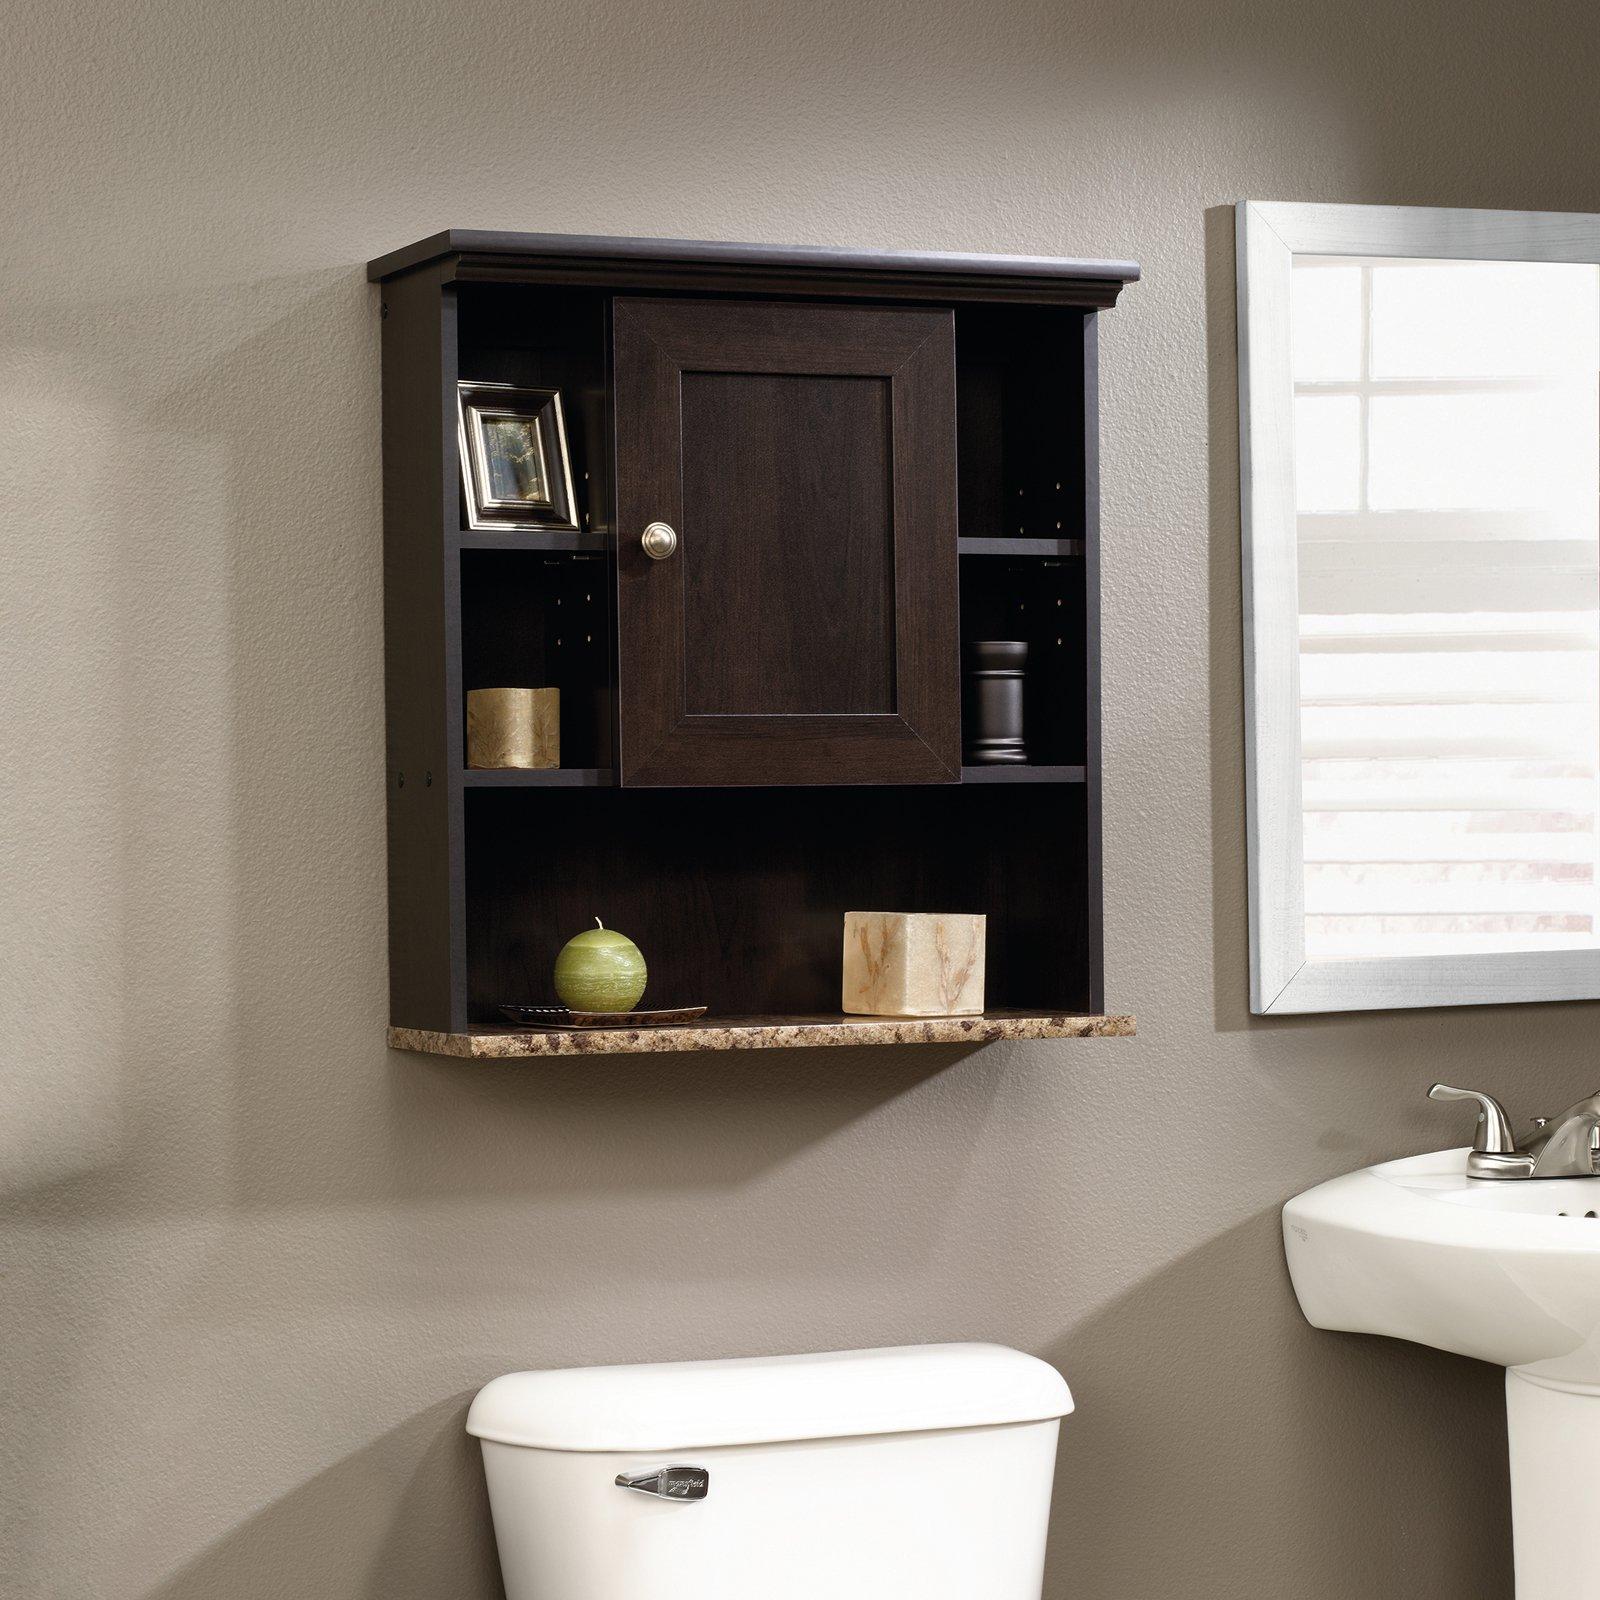 Sauder Peppercorn Wall Cabinet, Cinnamon Cherry for $32.23 @ Amazon